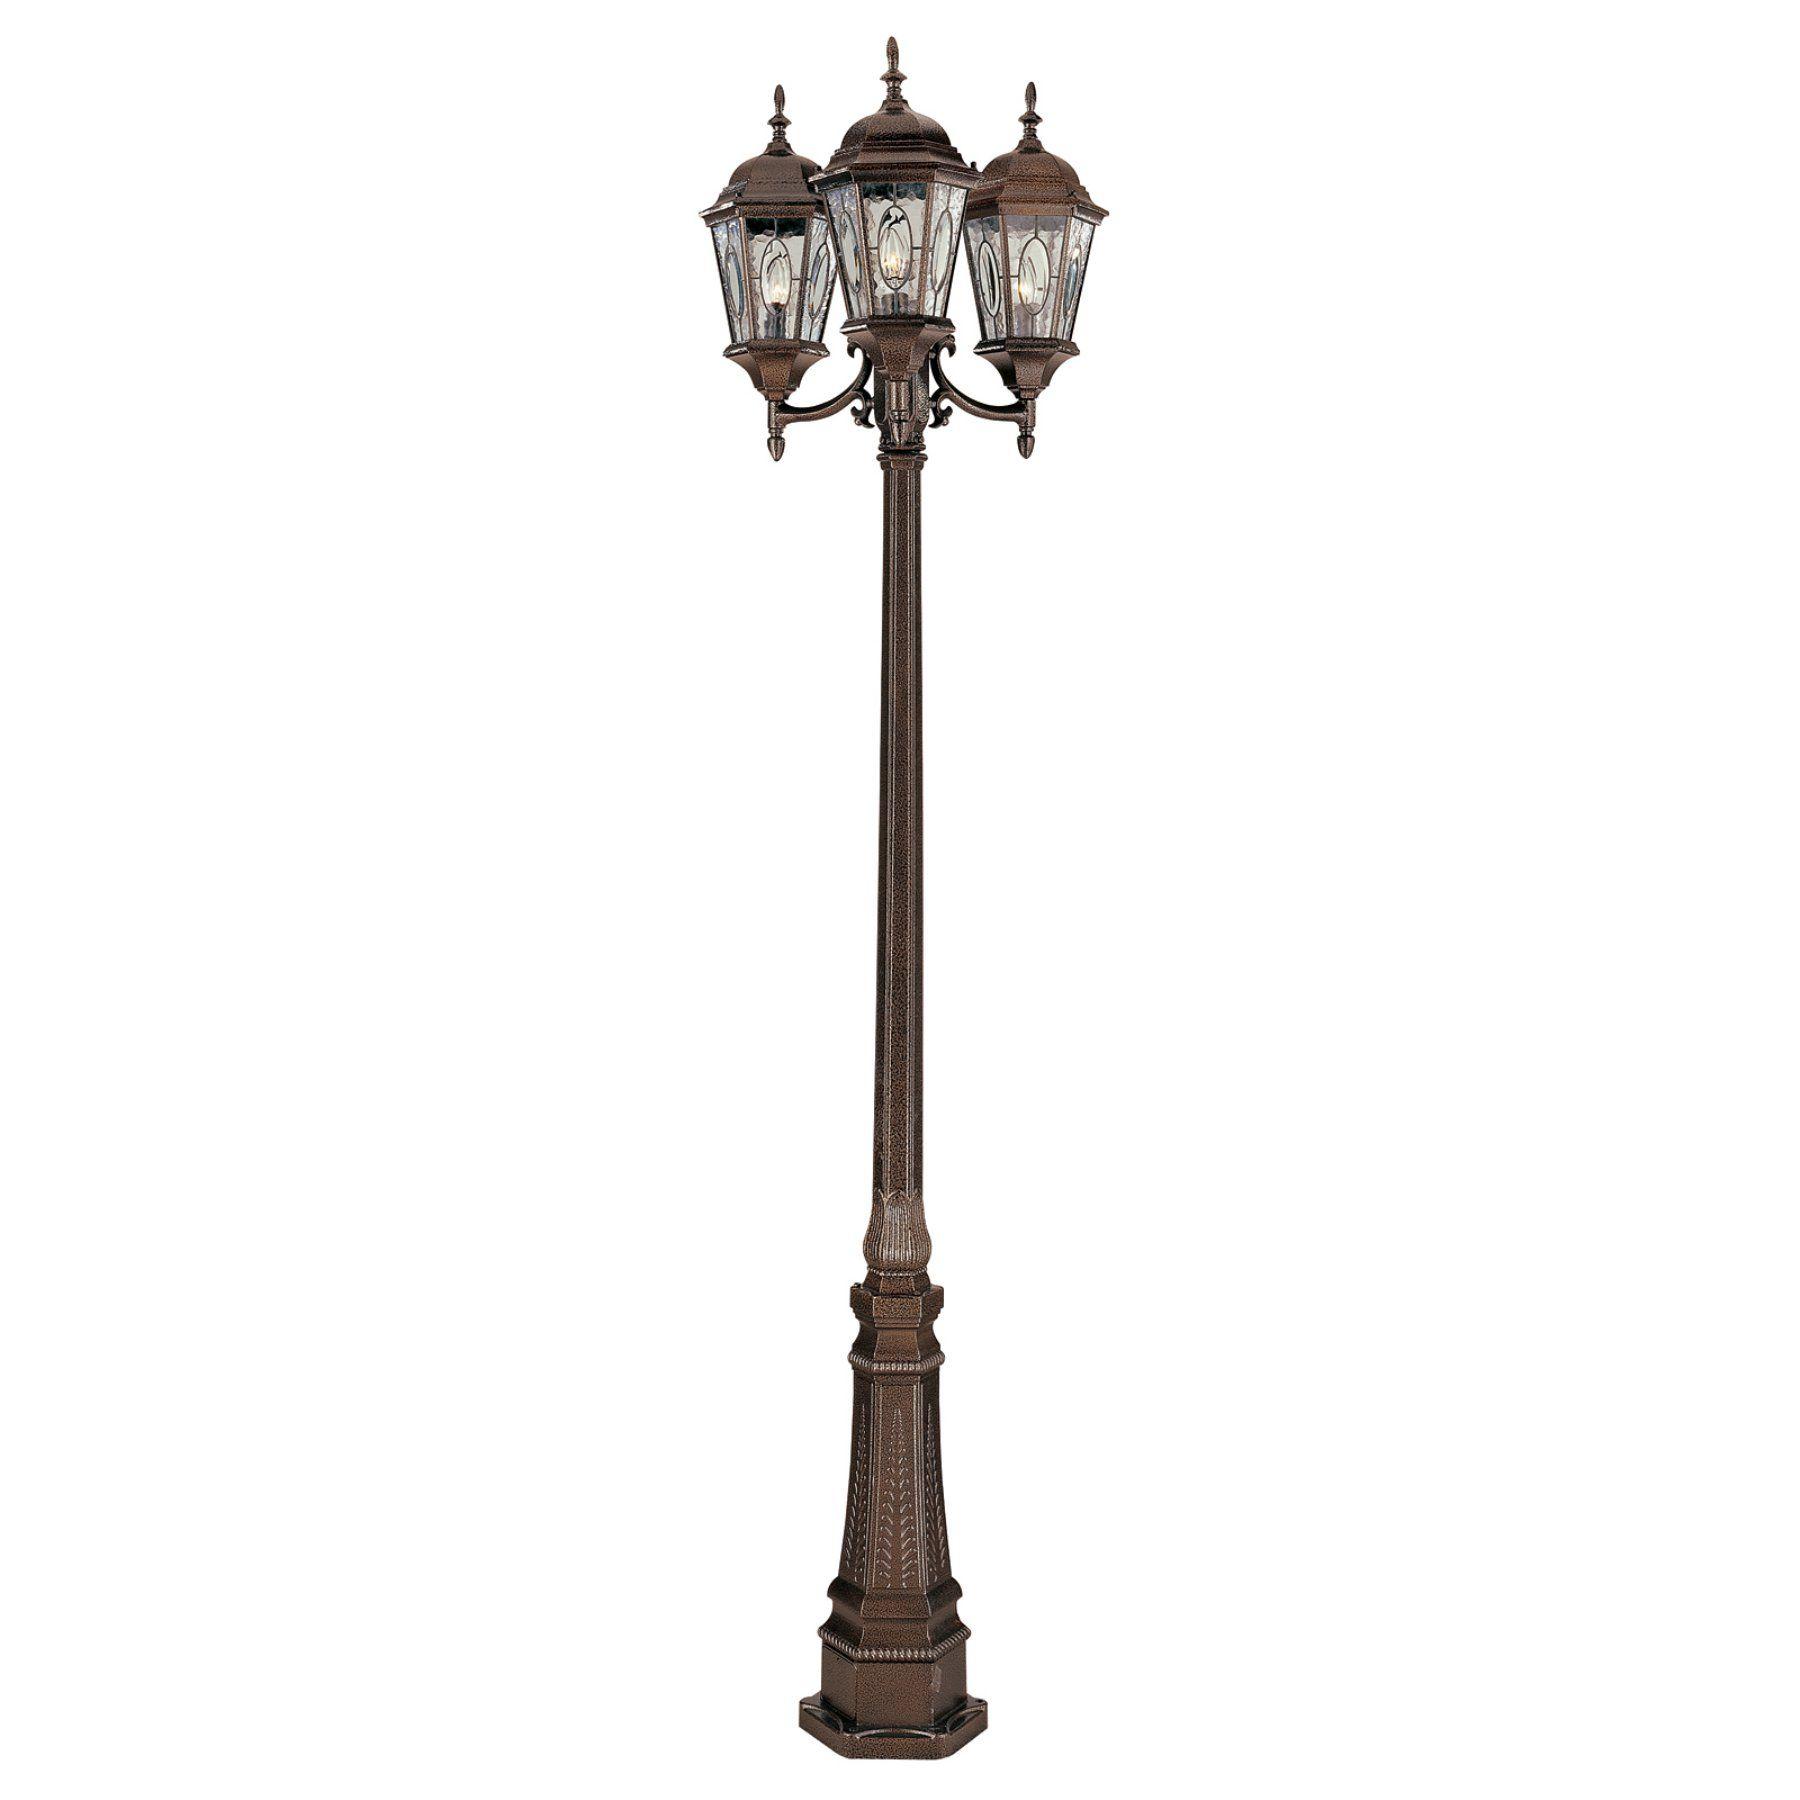 Bel Air Atkinson Outdoor Lamp Post 96h In 4719 Brz Outdoor Lamp Posts Outdoor Post Lights Lamp Post Lights